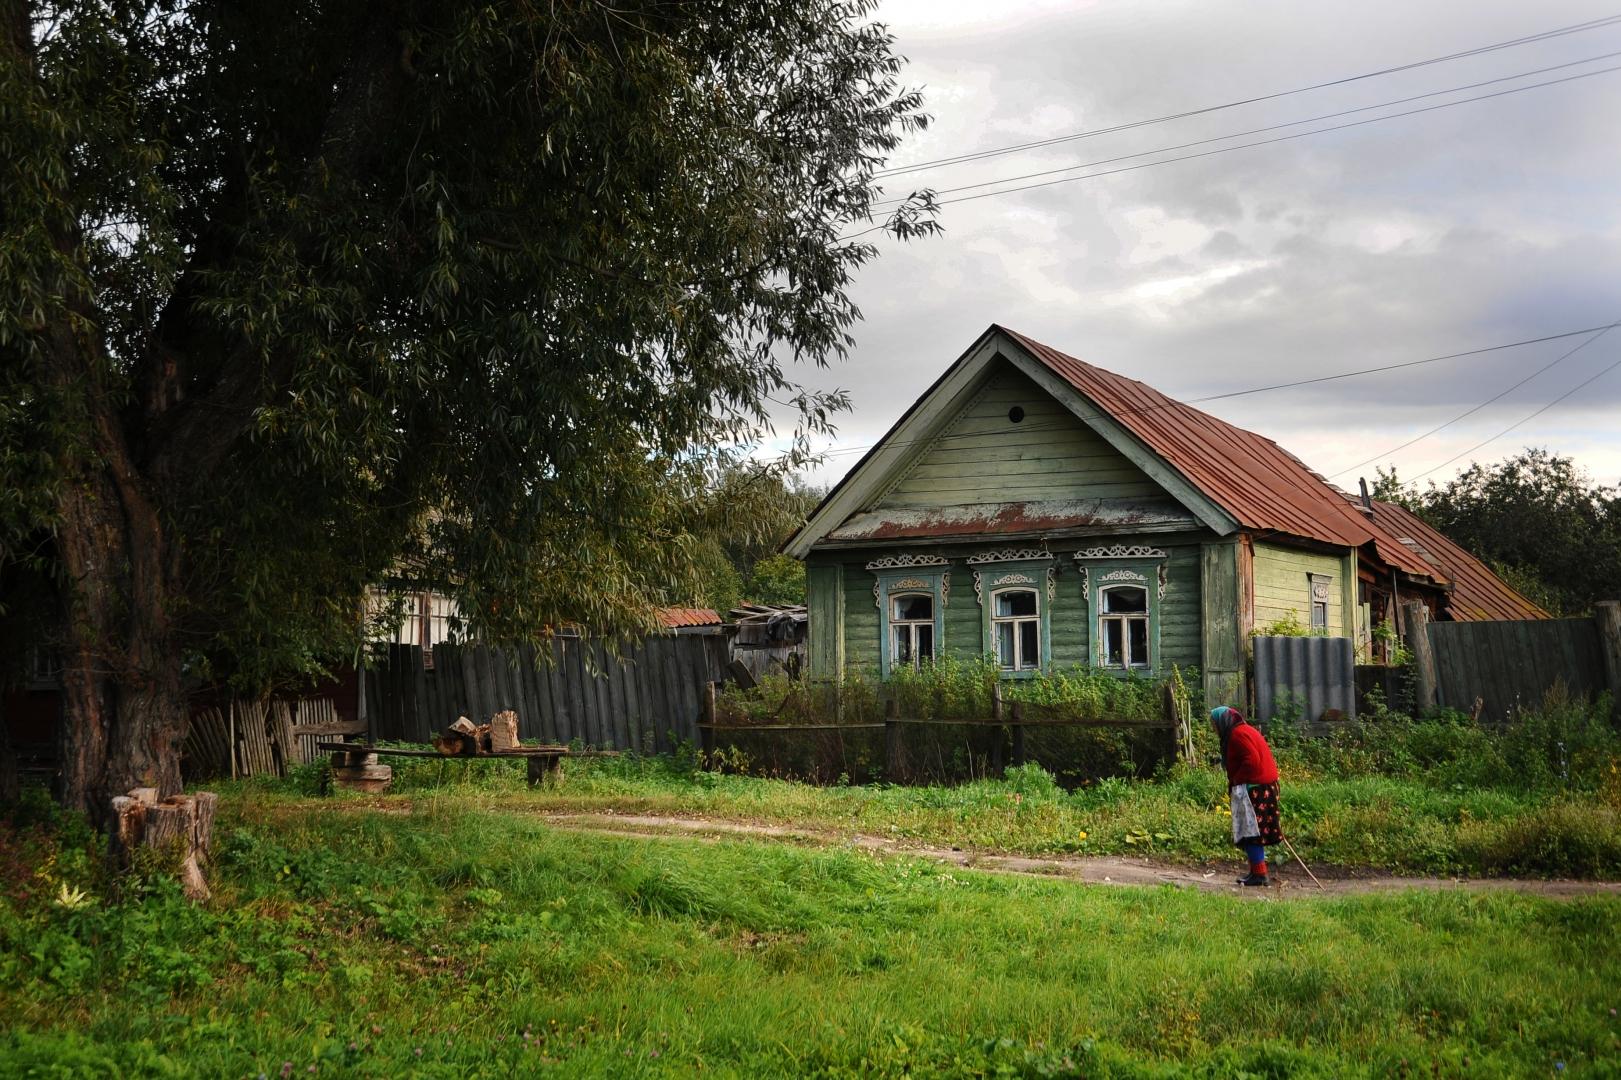 068fdd0cc572 Бедность как традиция - Екатерина Шилкина - ИА REGNUM